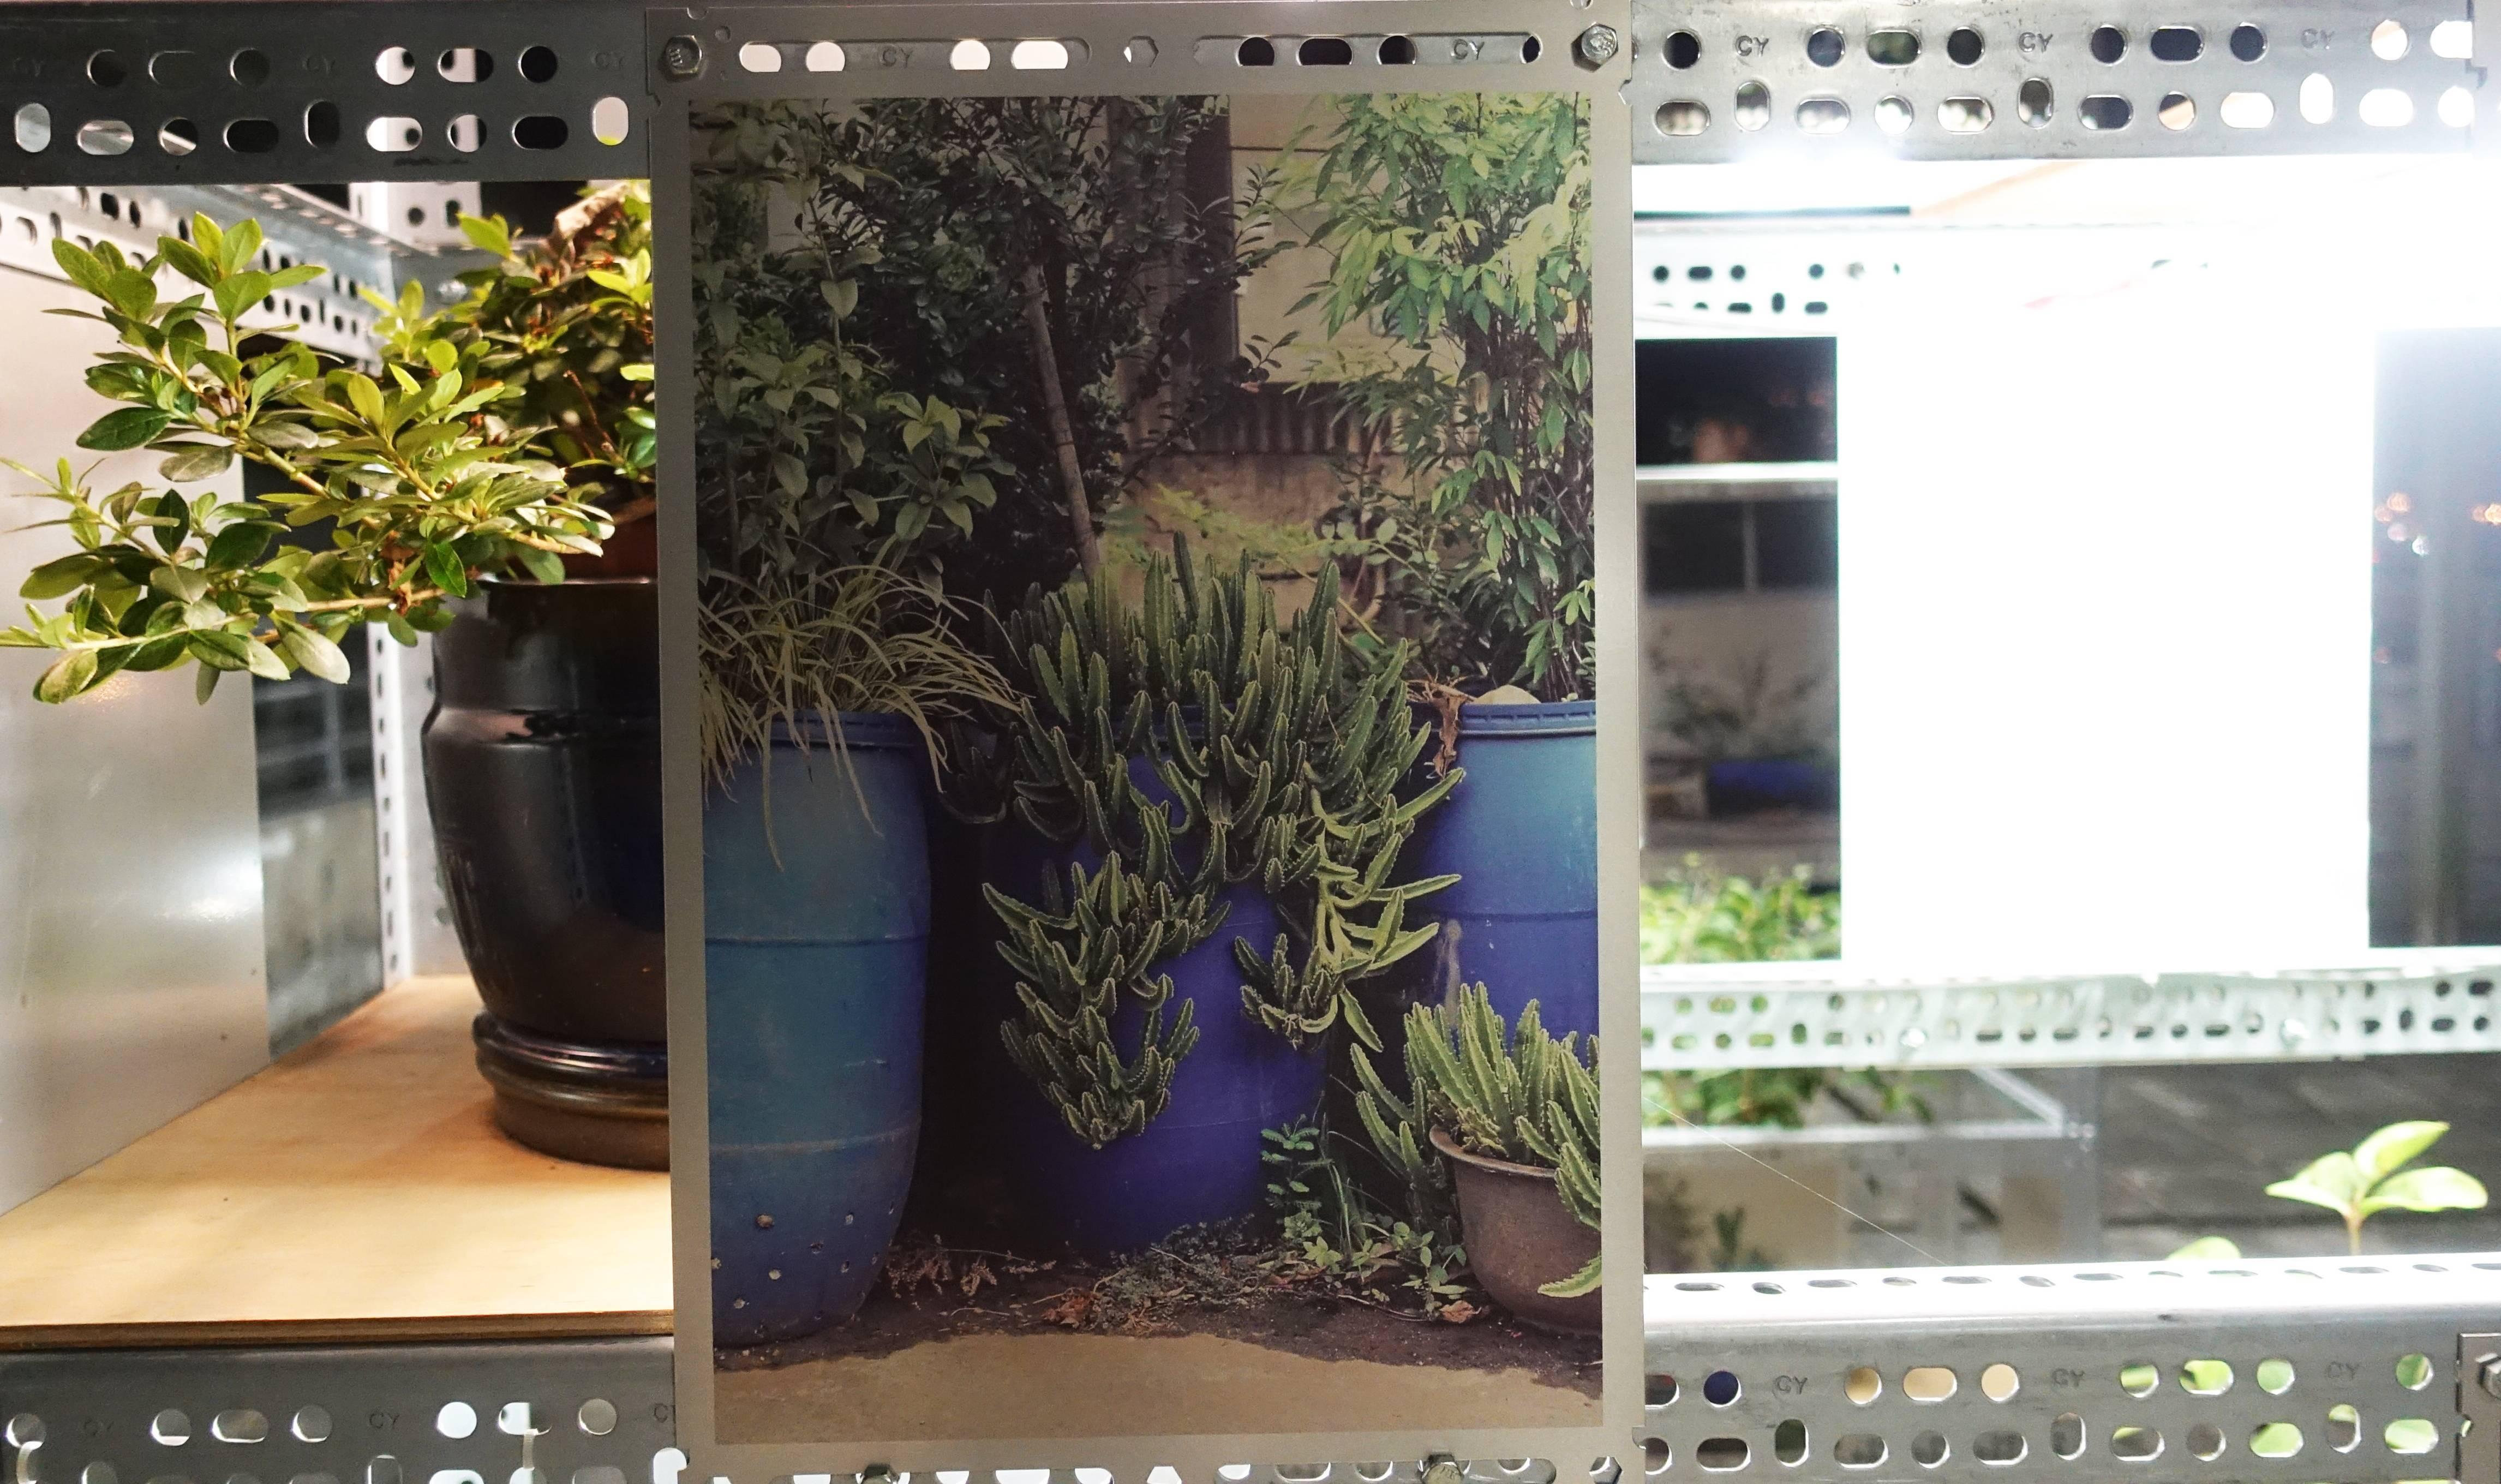 吳權倫 WU Chuan-Lun,〈街替器〉JTC(Juxtaposed Temporary Container)。圖/非池中藝術網攝。